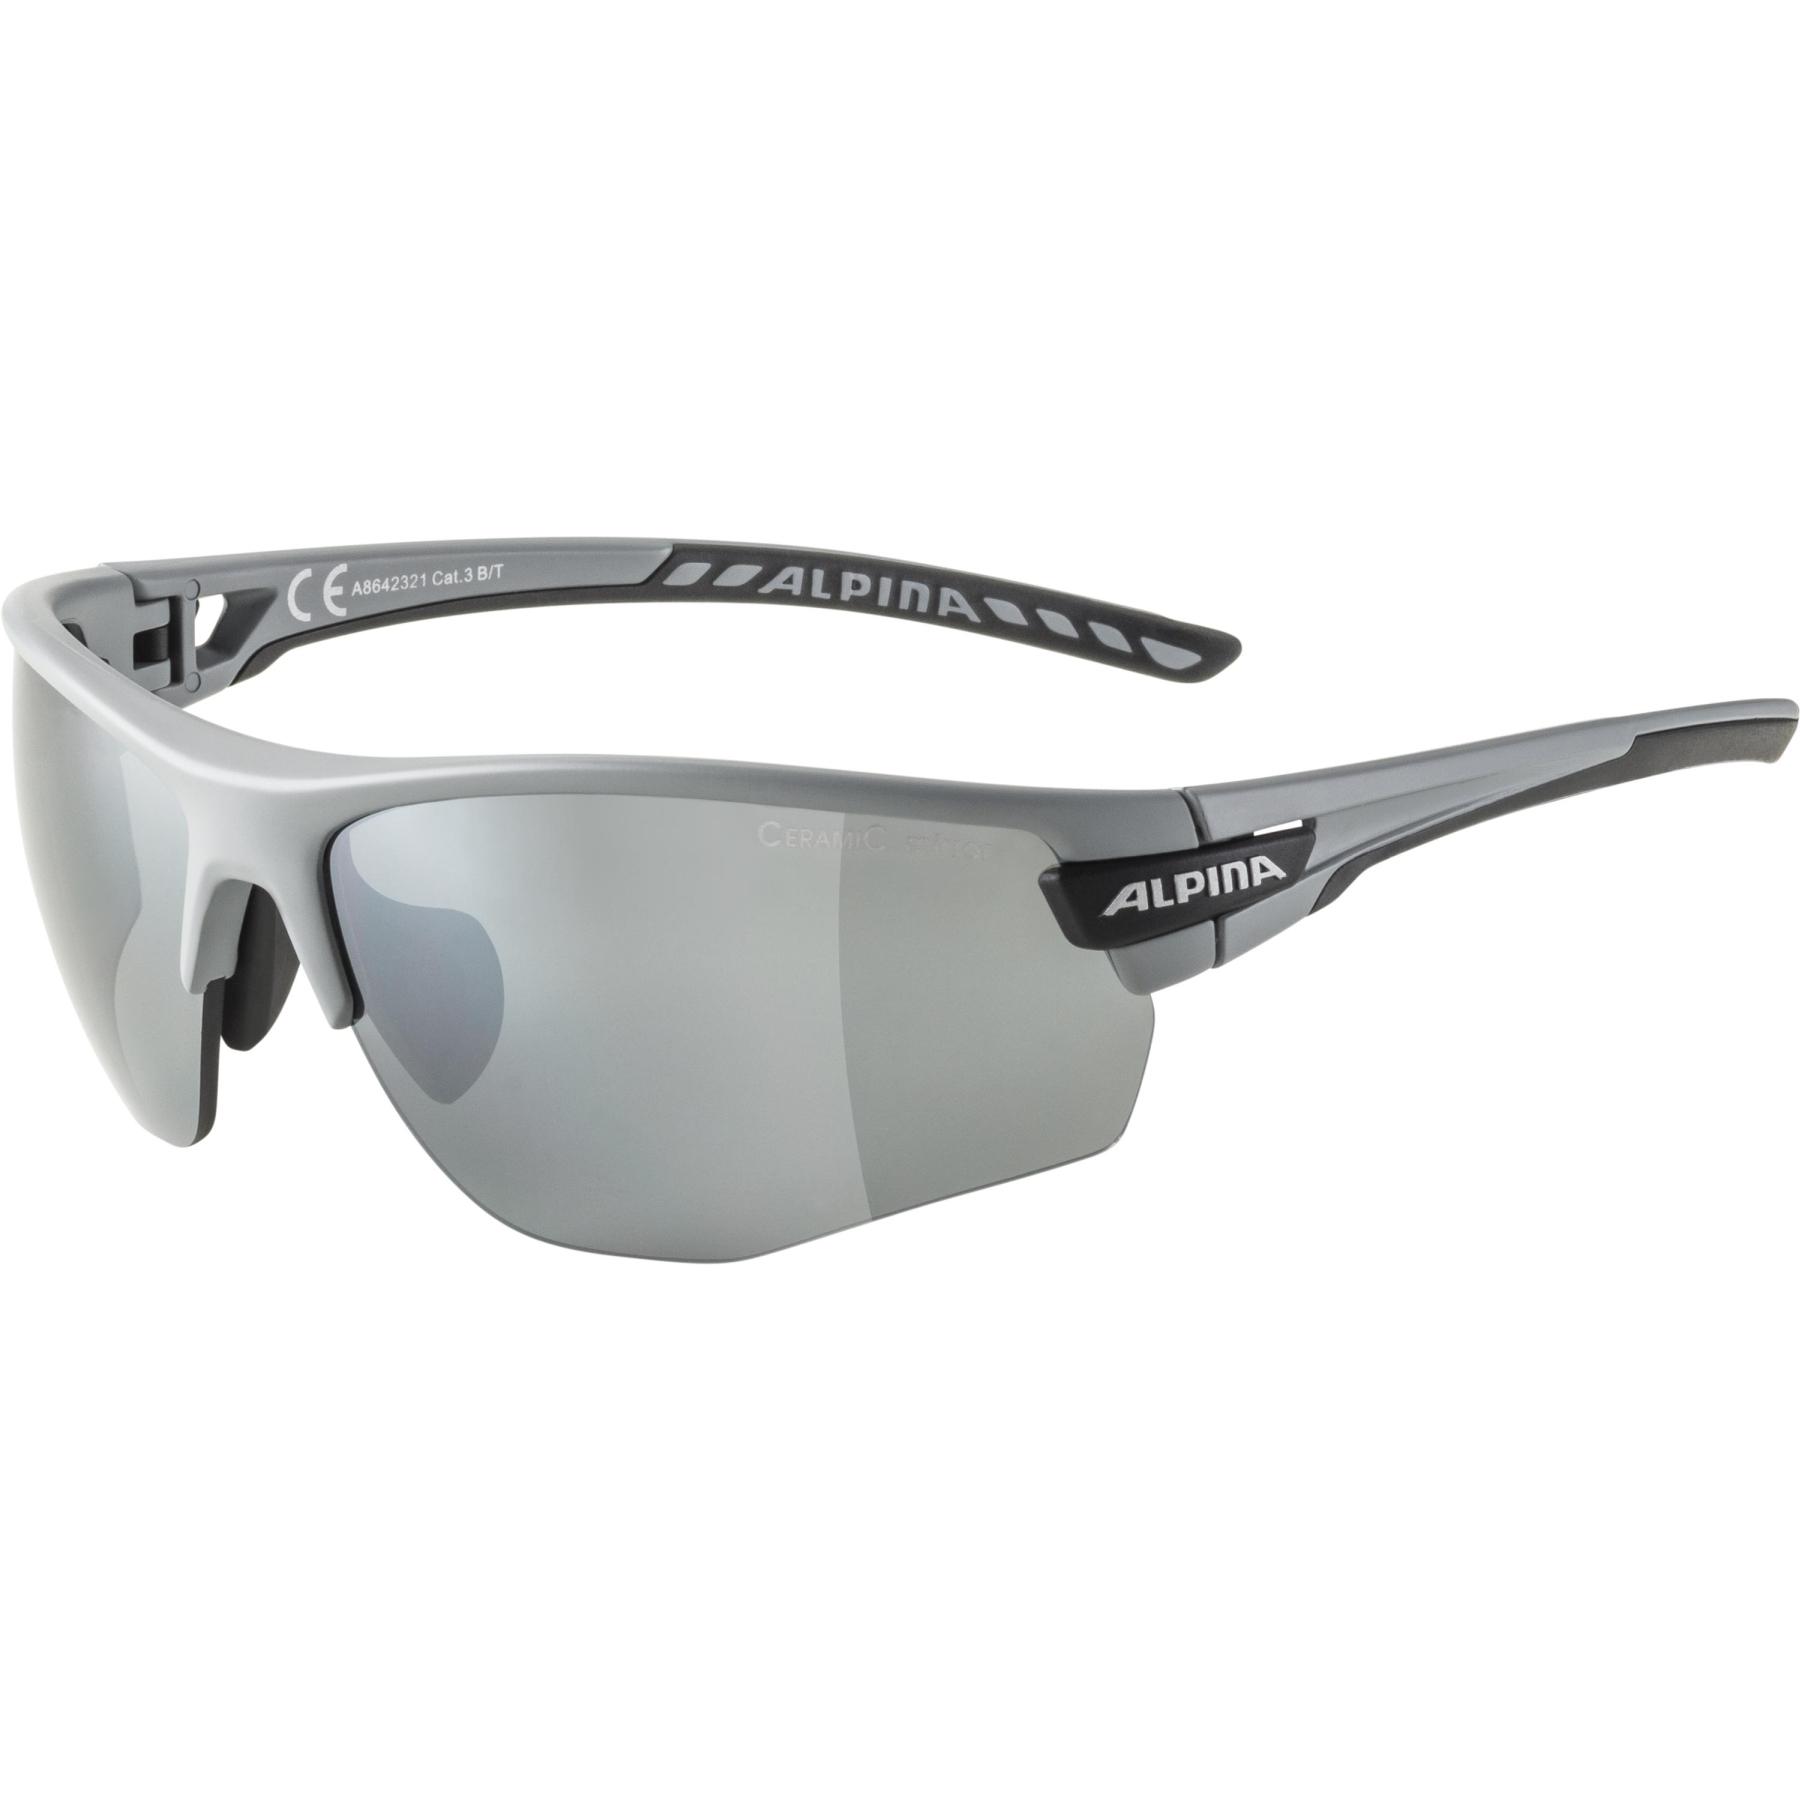 Alpina Tri-Scray 2.0 HR Glasses - grey matt  / black mirror + orange mirror + clear